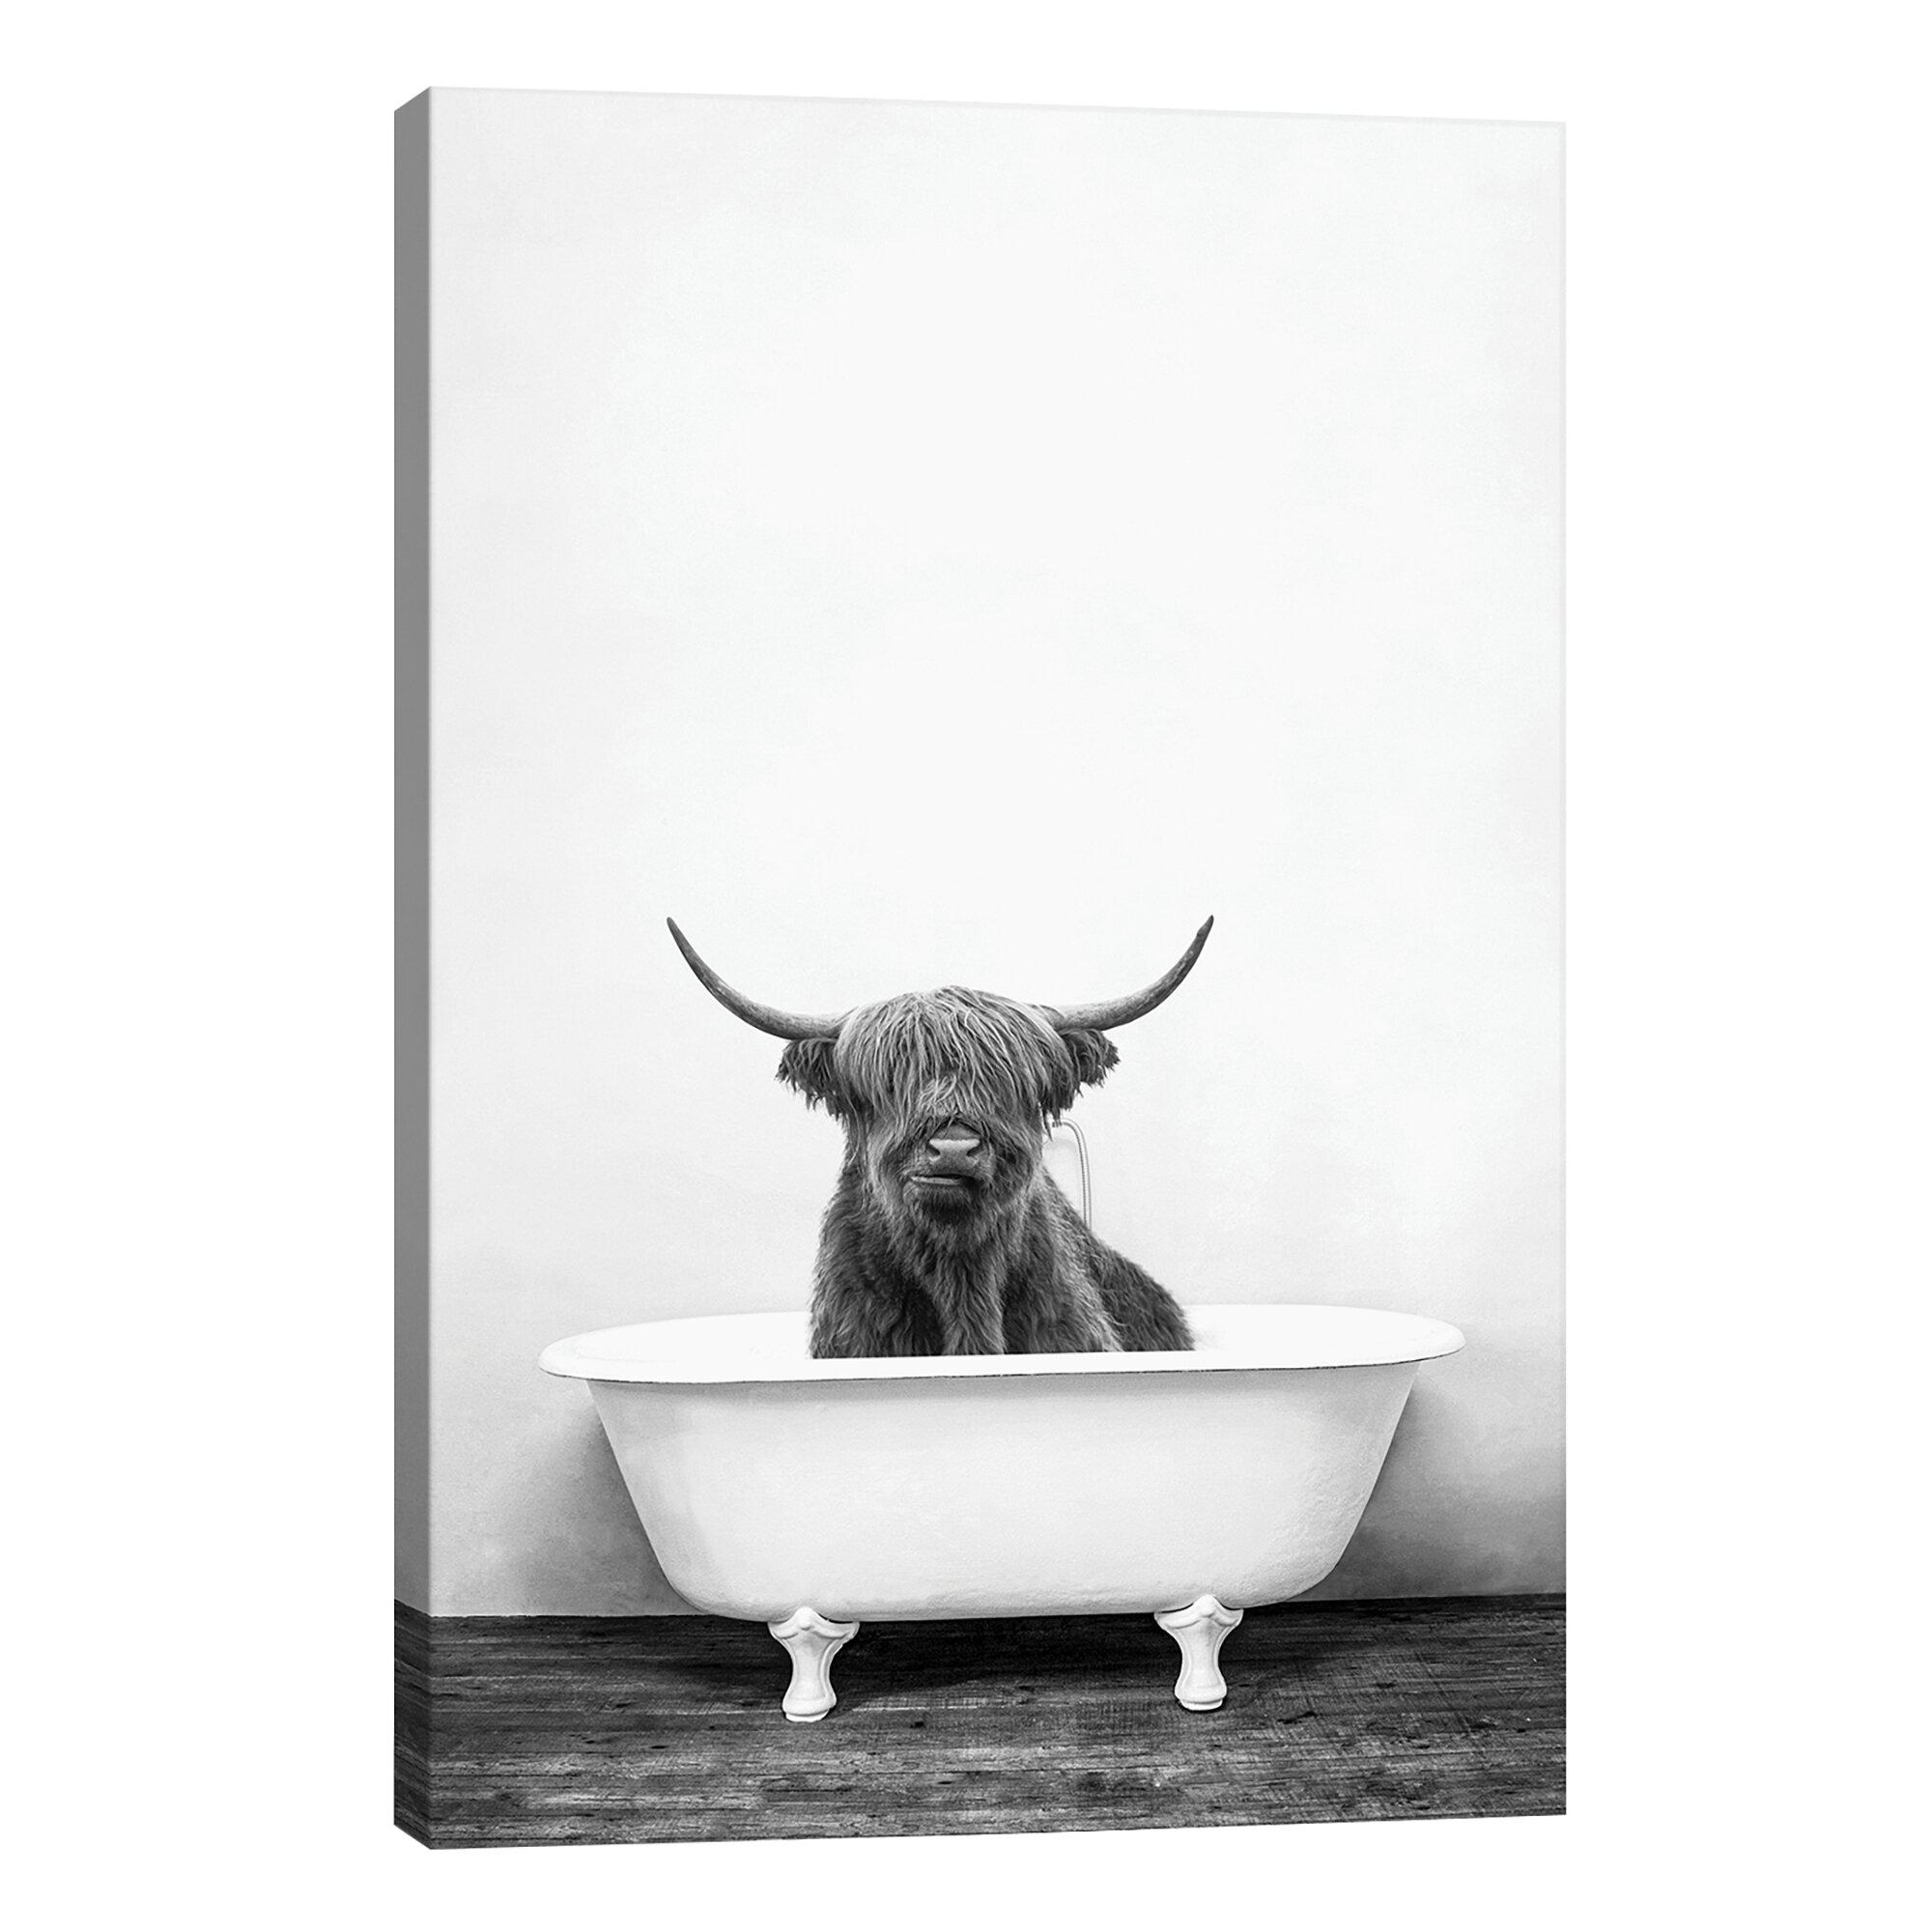 Bath Laundry Wall Art You Ll Love Wayfair Co Uk